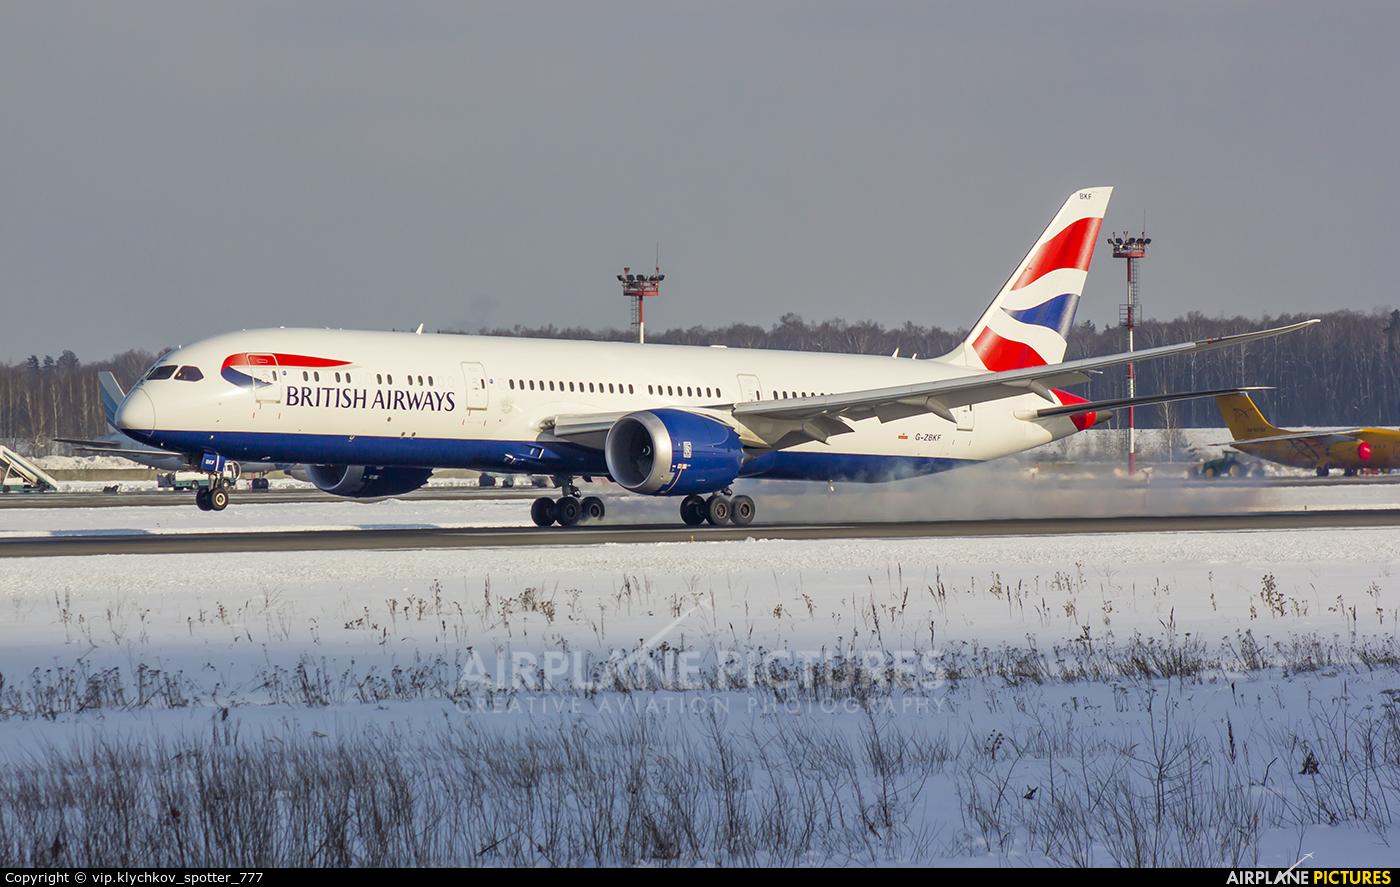 British Airways G-ZBKF aircraft at Moscow - Domodedovo